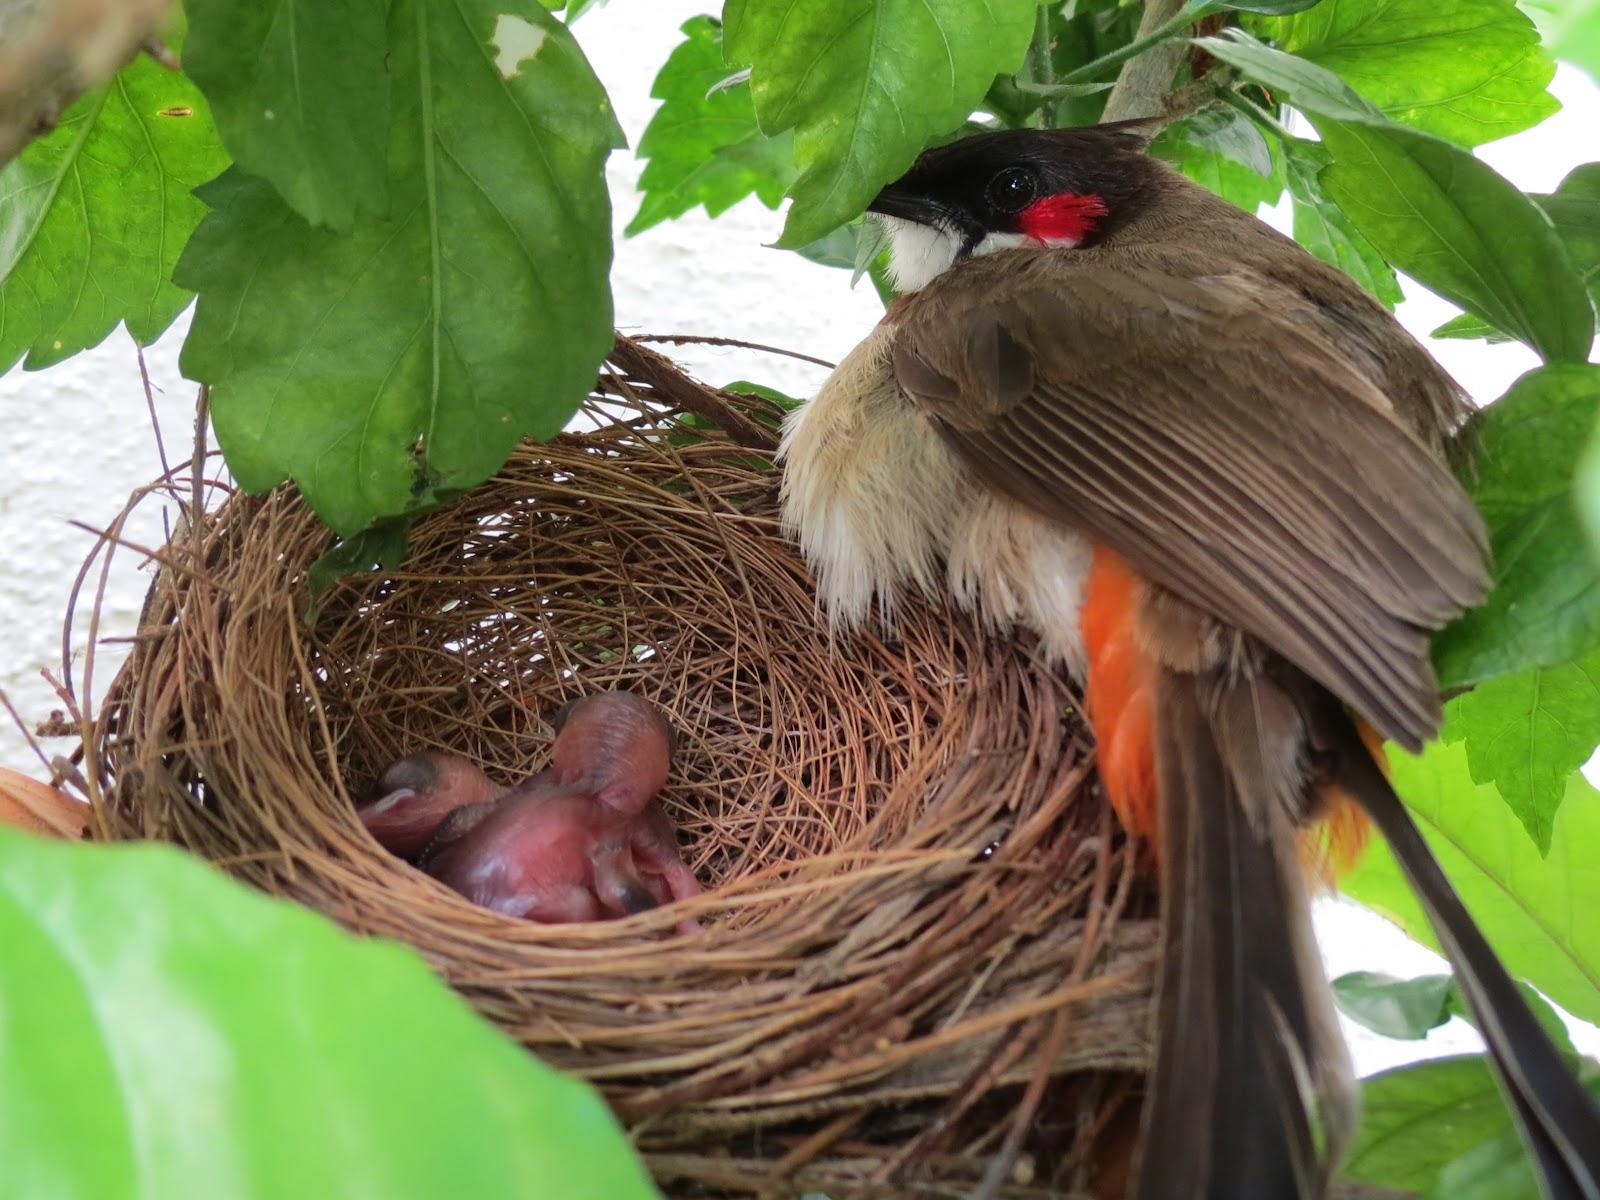 red bird nest and - photo #38